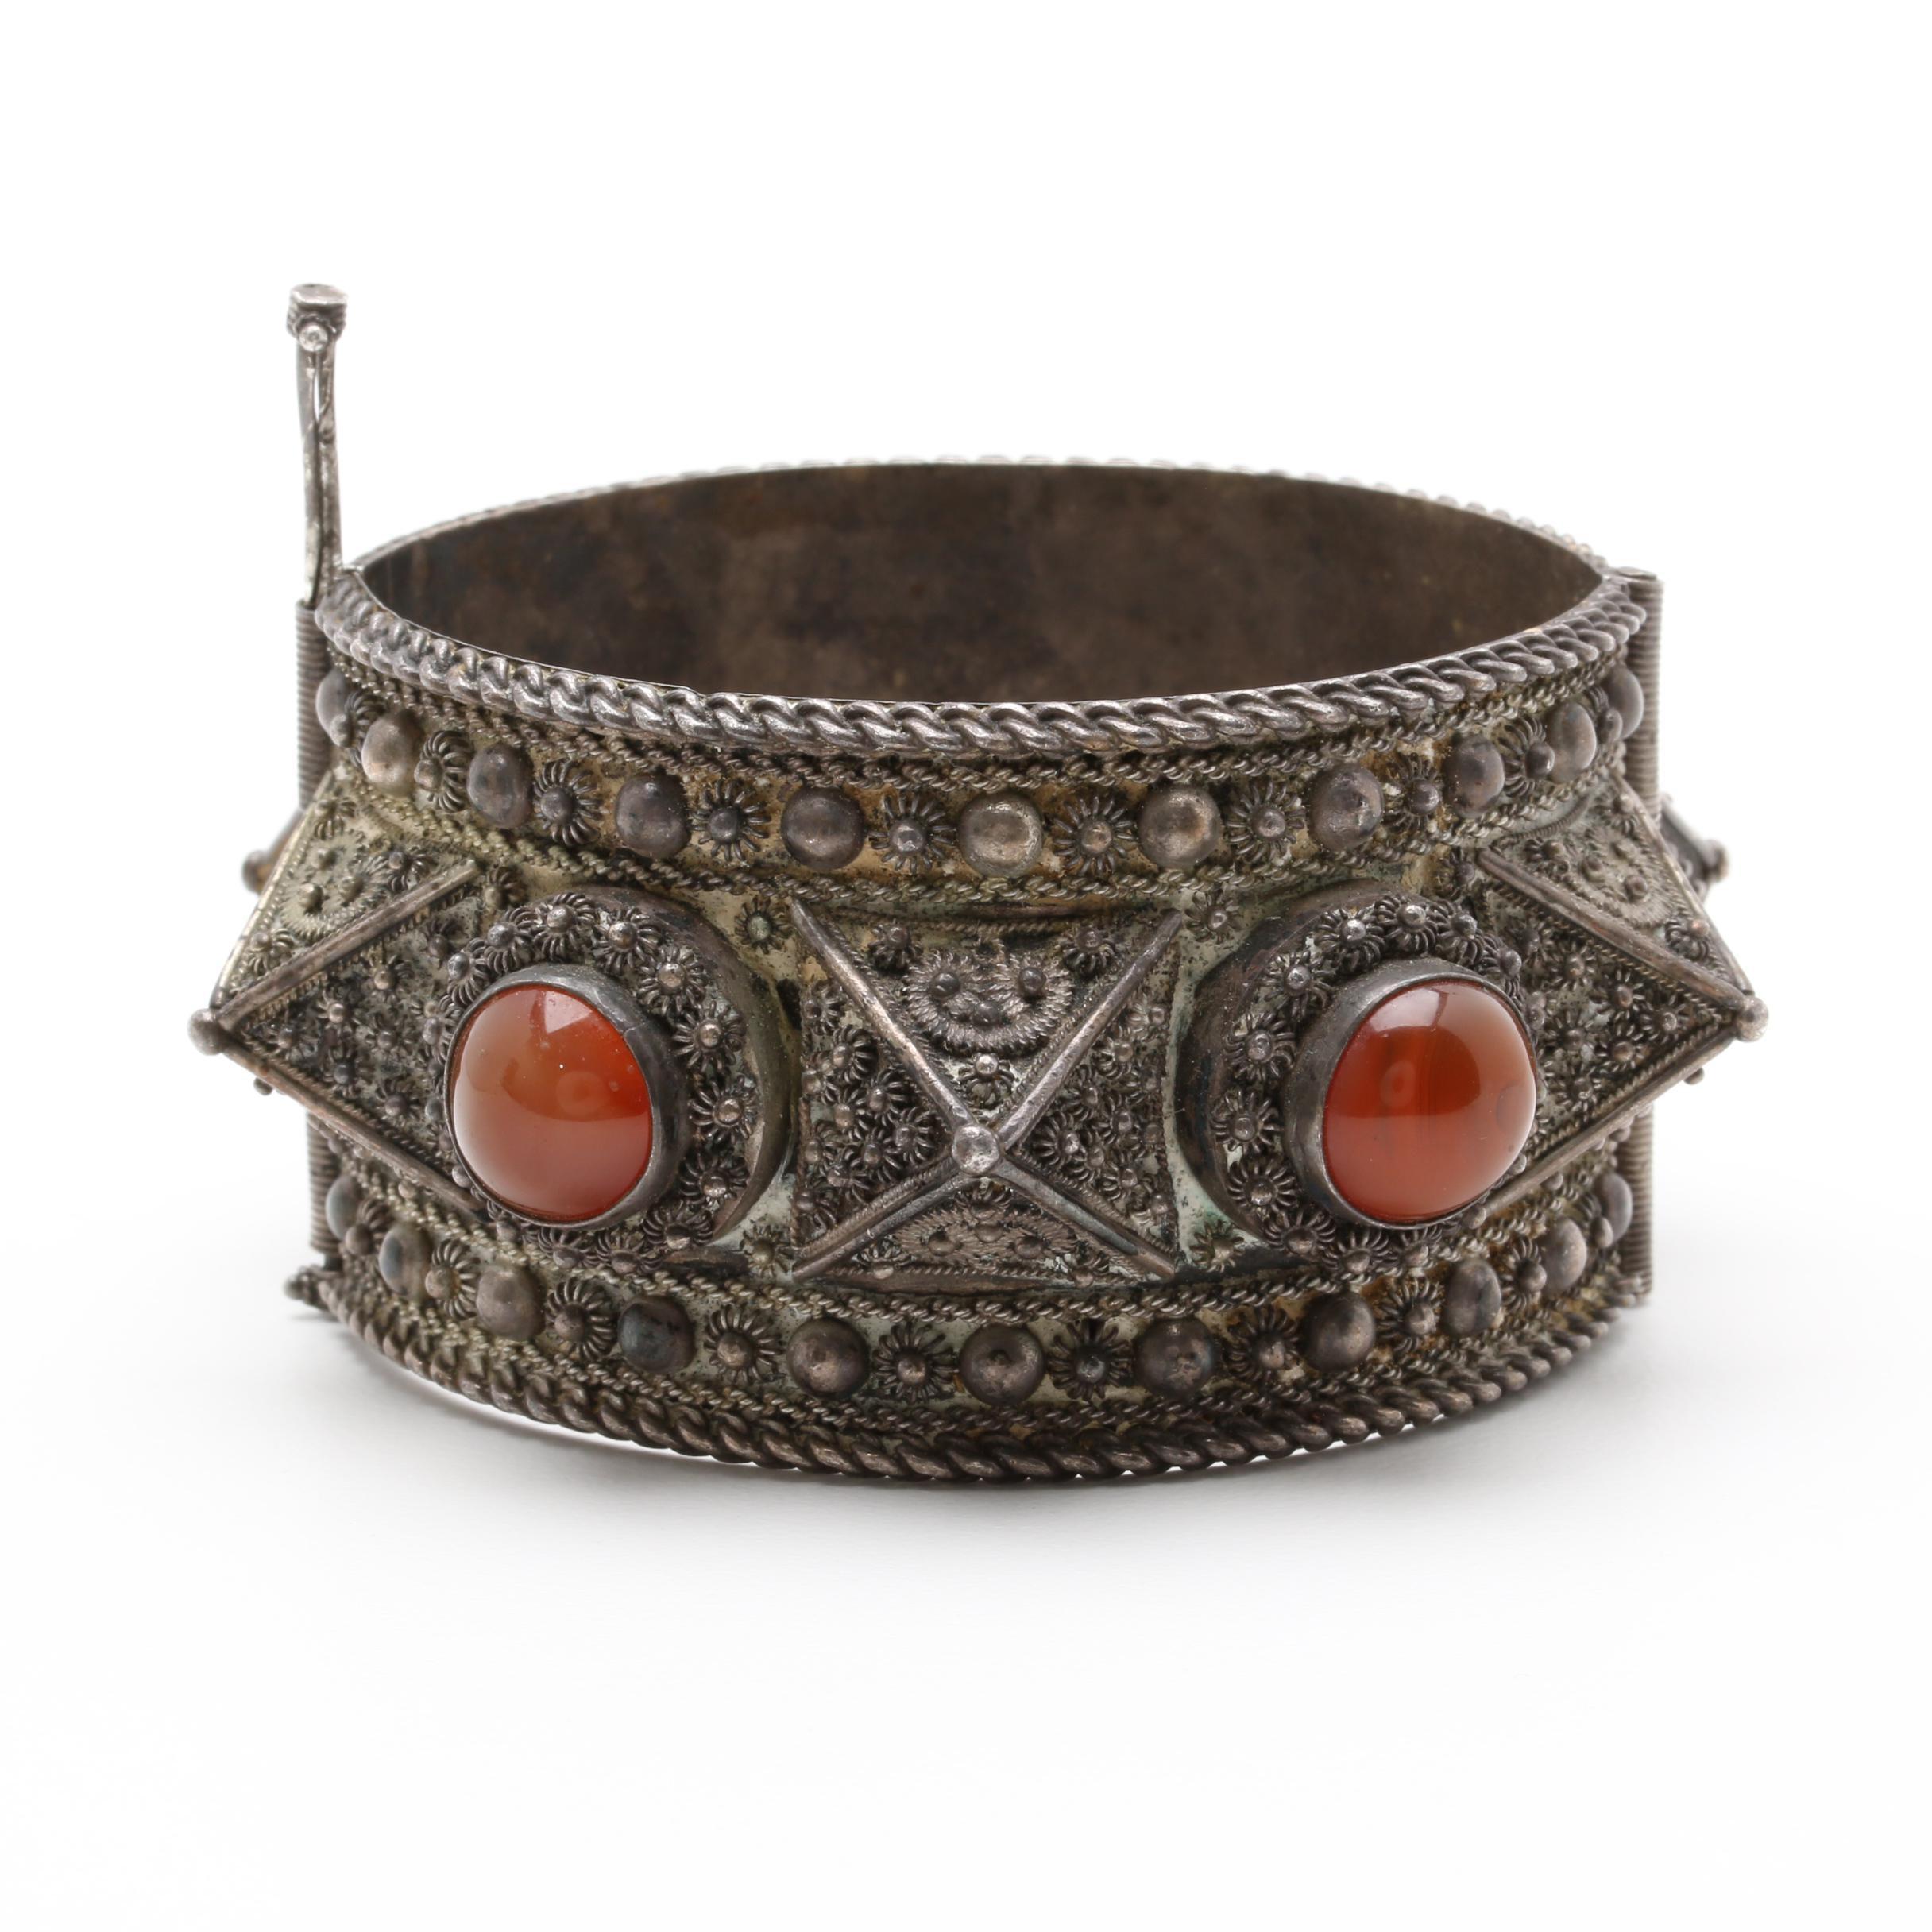 Vintage Lebanese Sterling Silver Agate Hinged Bangle Bracelet